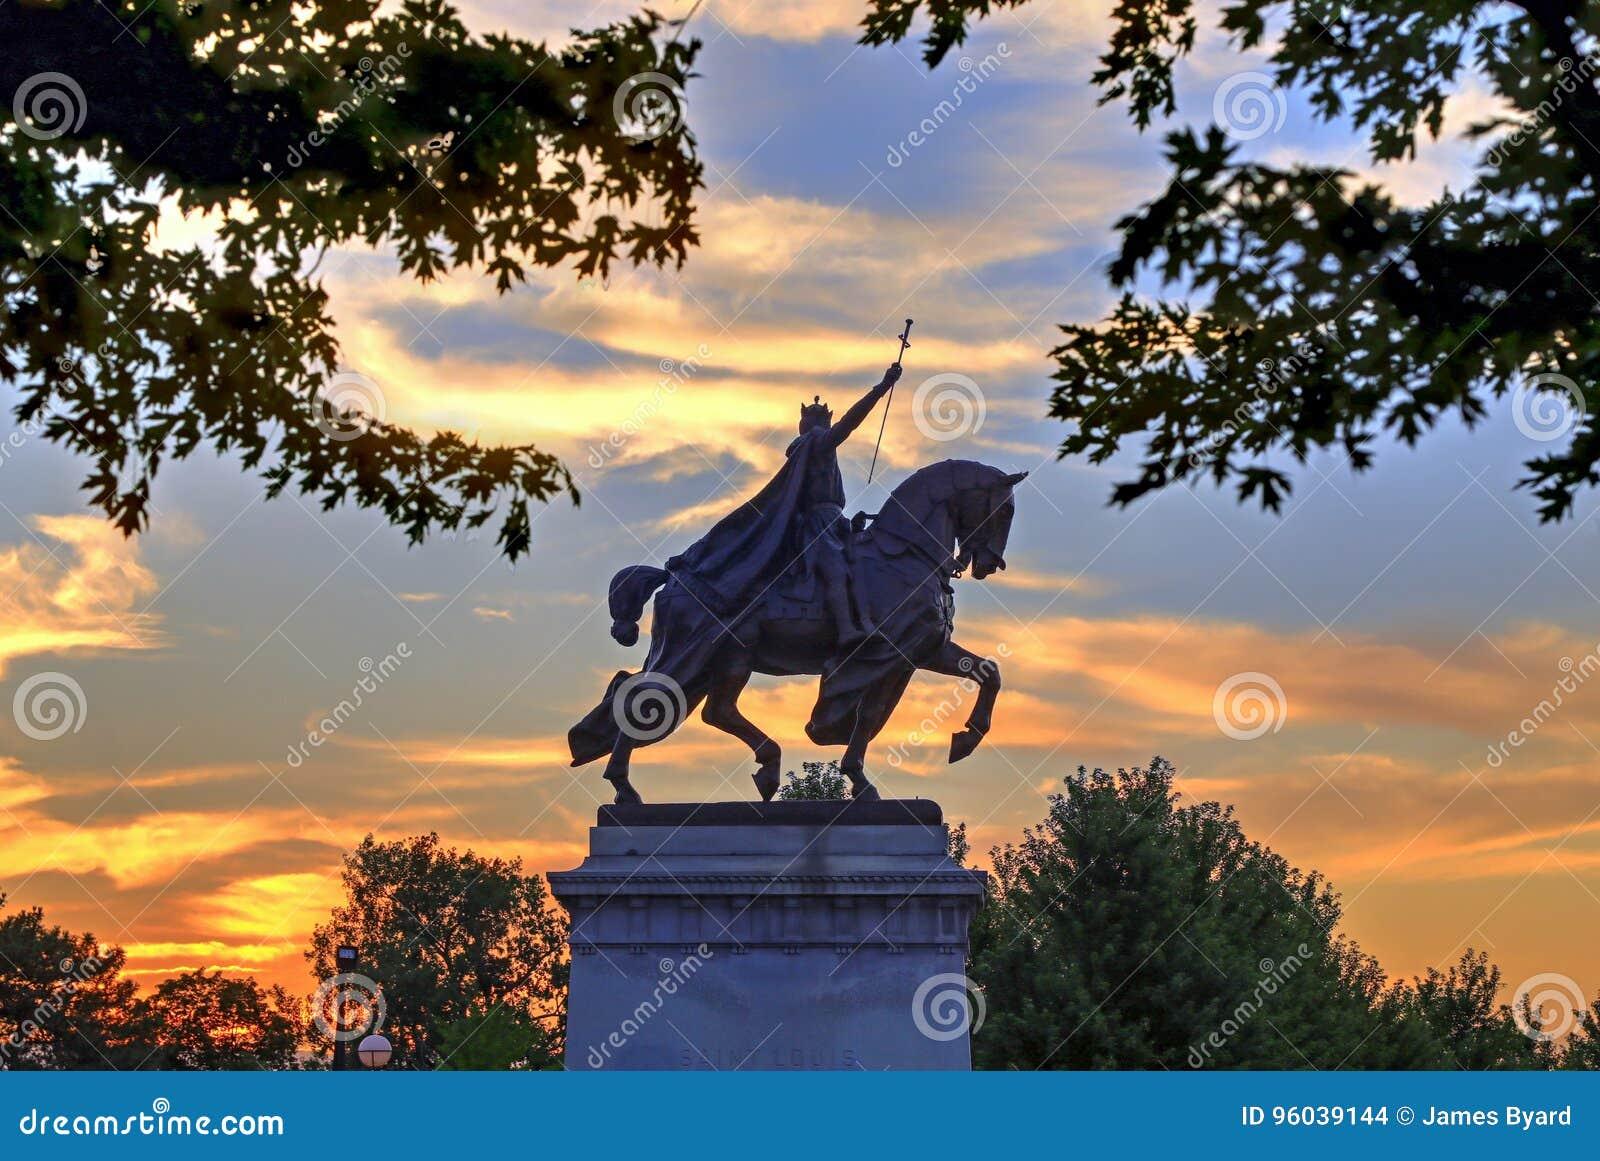 St Louis Statue Stock Photo Image Of Public Sunrise 96039144